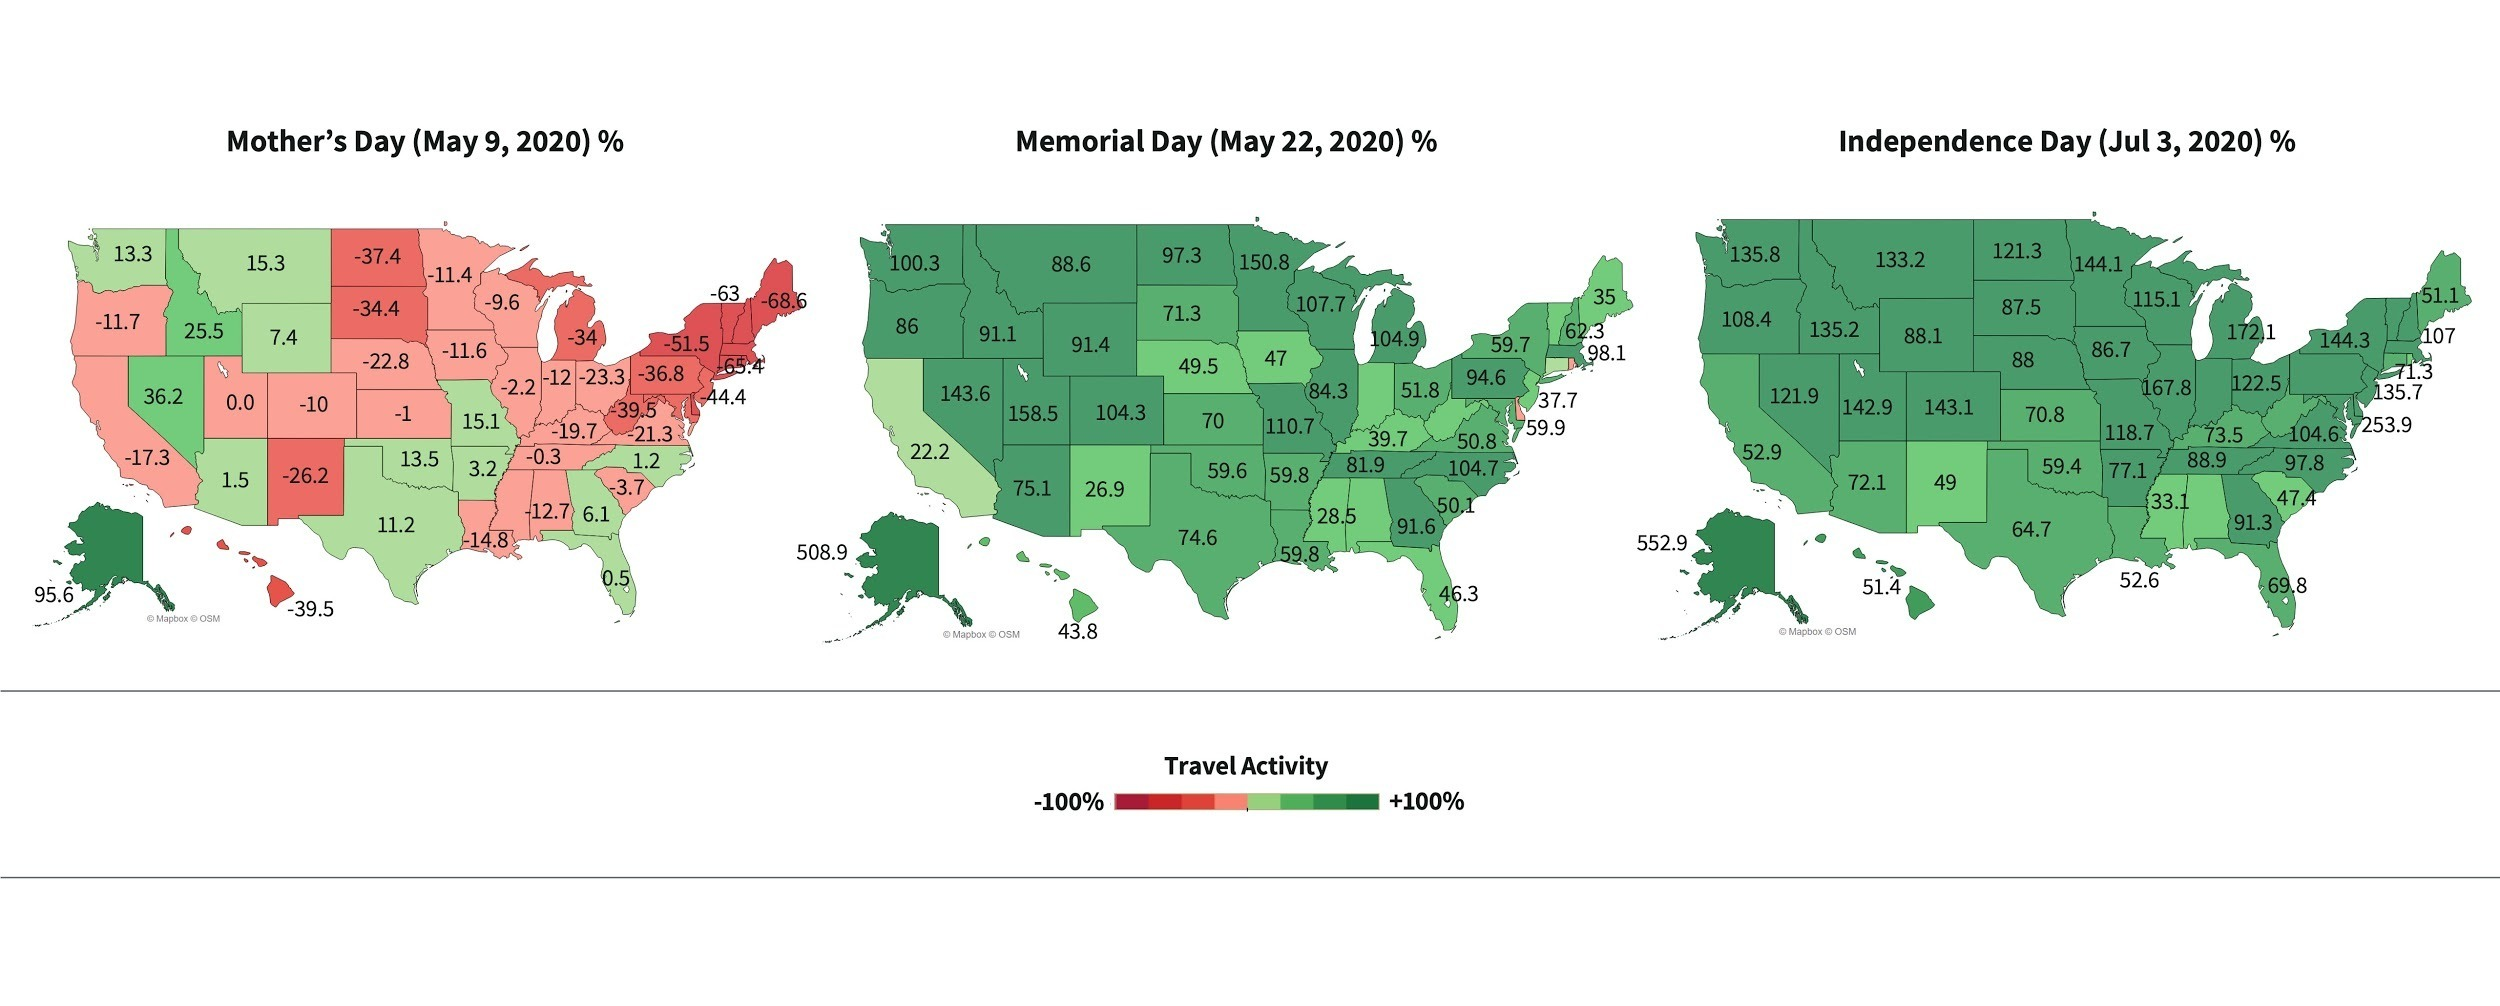 Arrivalist U.S. Travel Index July 4, 2020